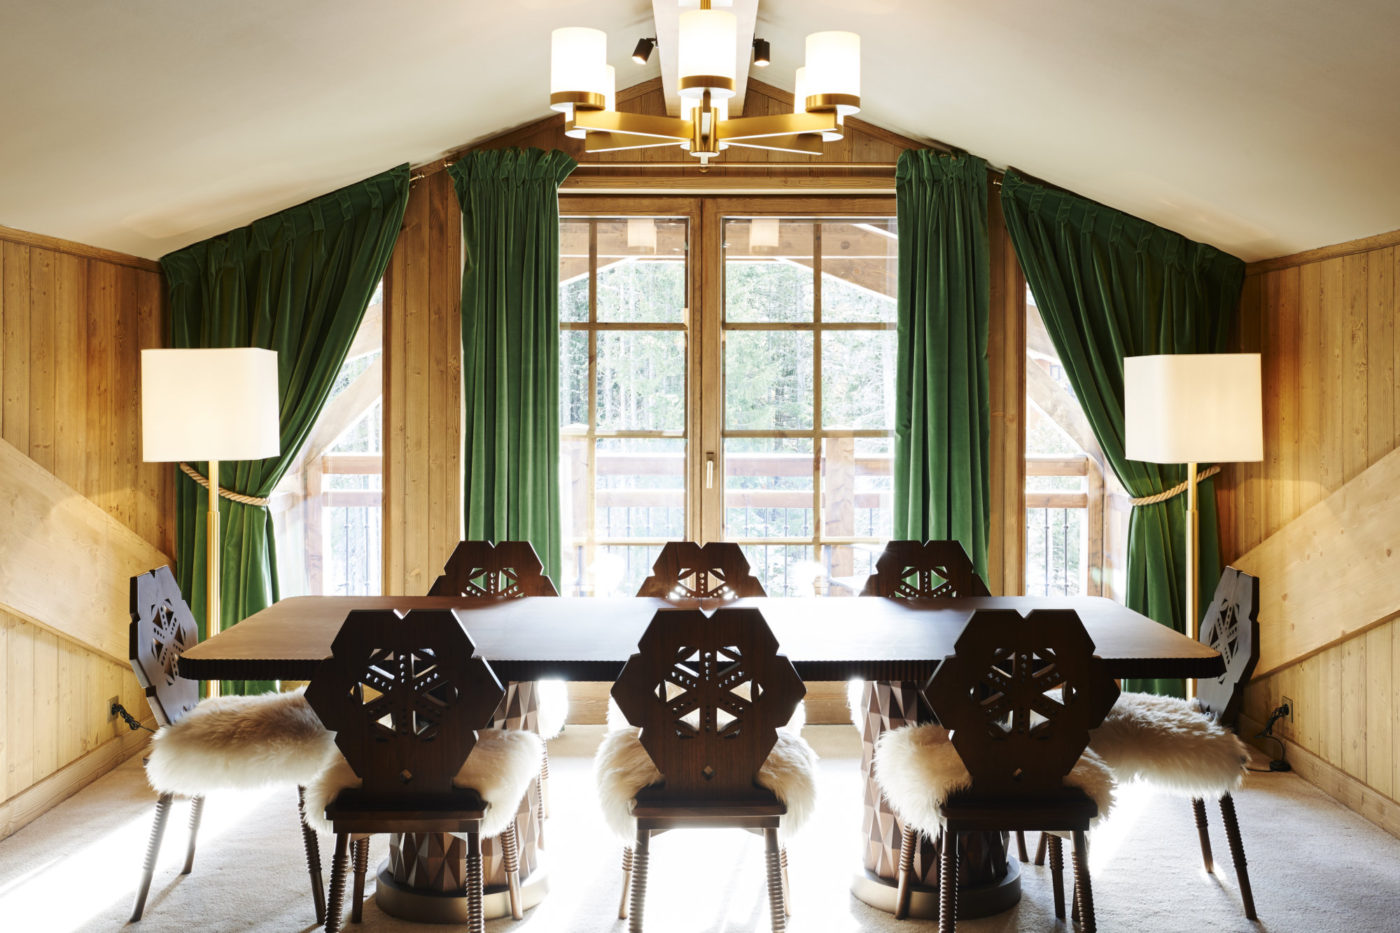 India Mahdavi- Interior Design Projects-lapogee_2010_hotel